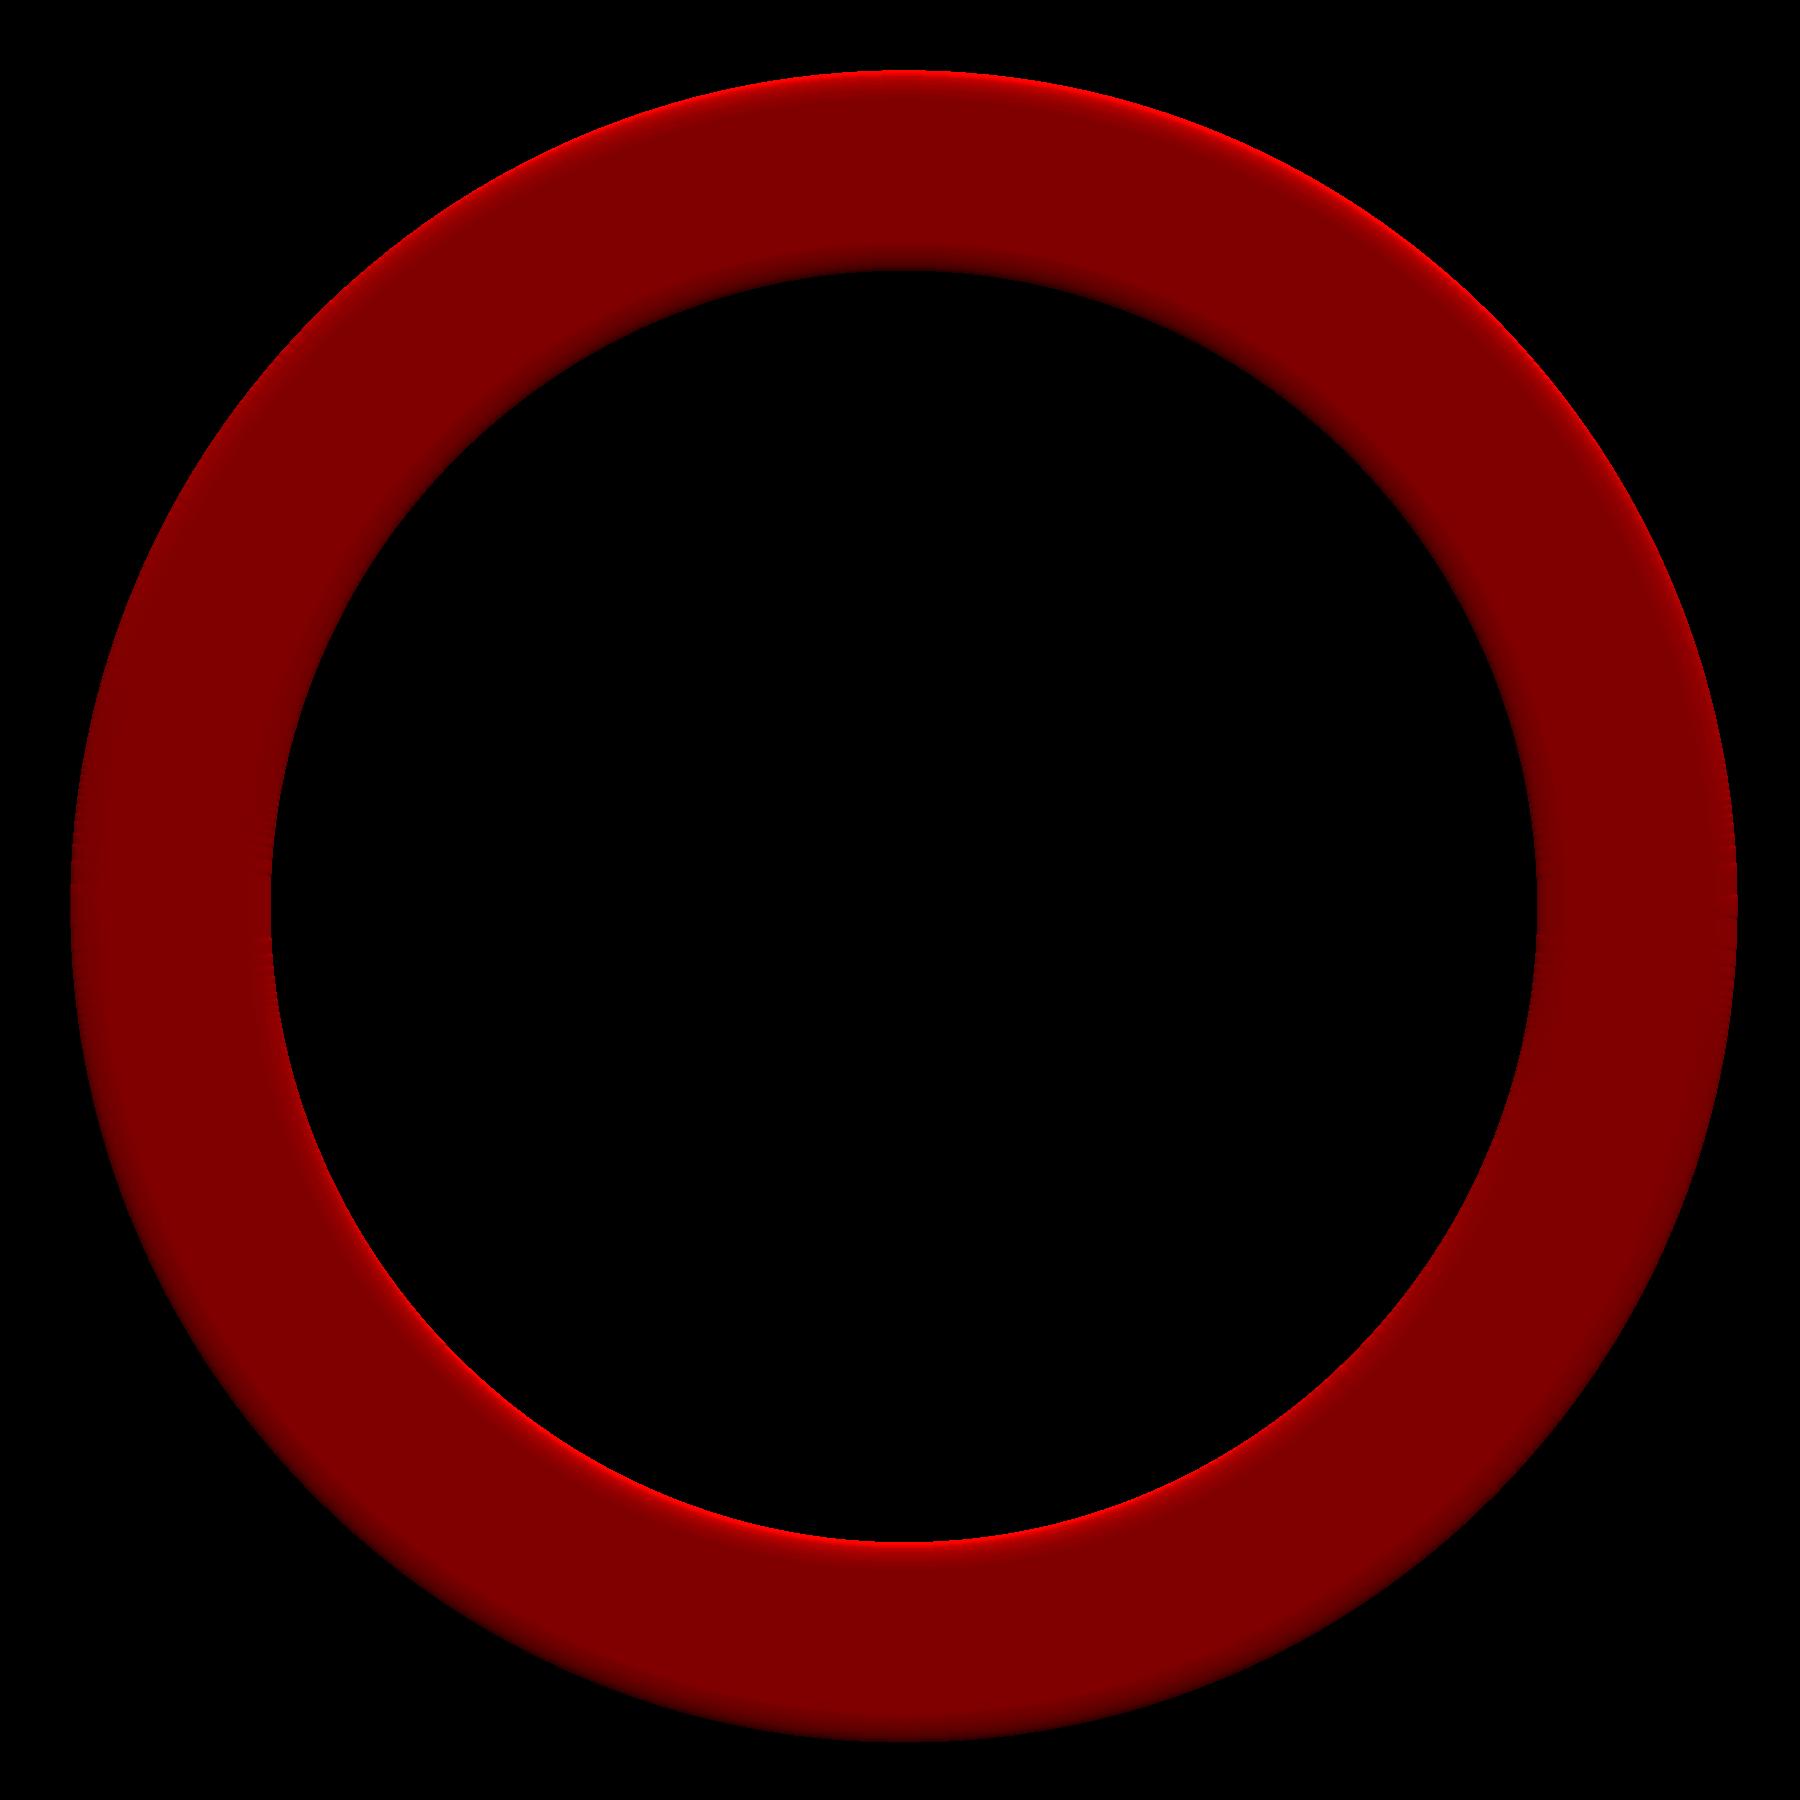 Circle png clipart best for Transparent top design